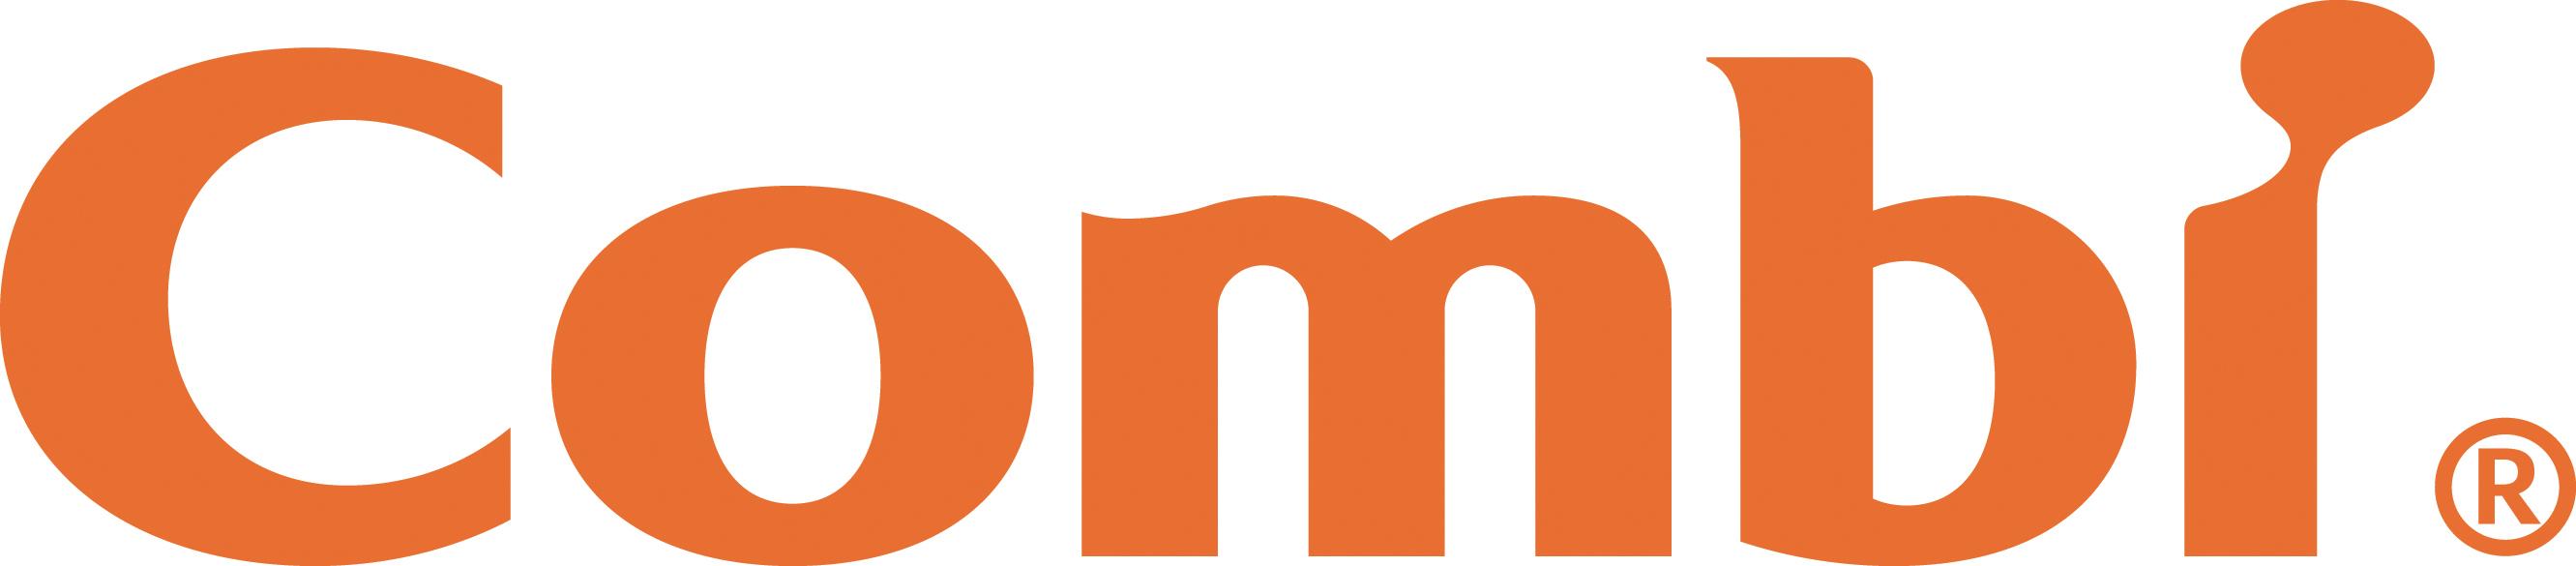 Combi Product Registration